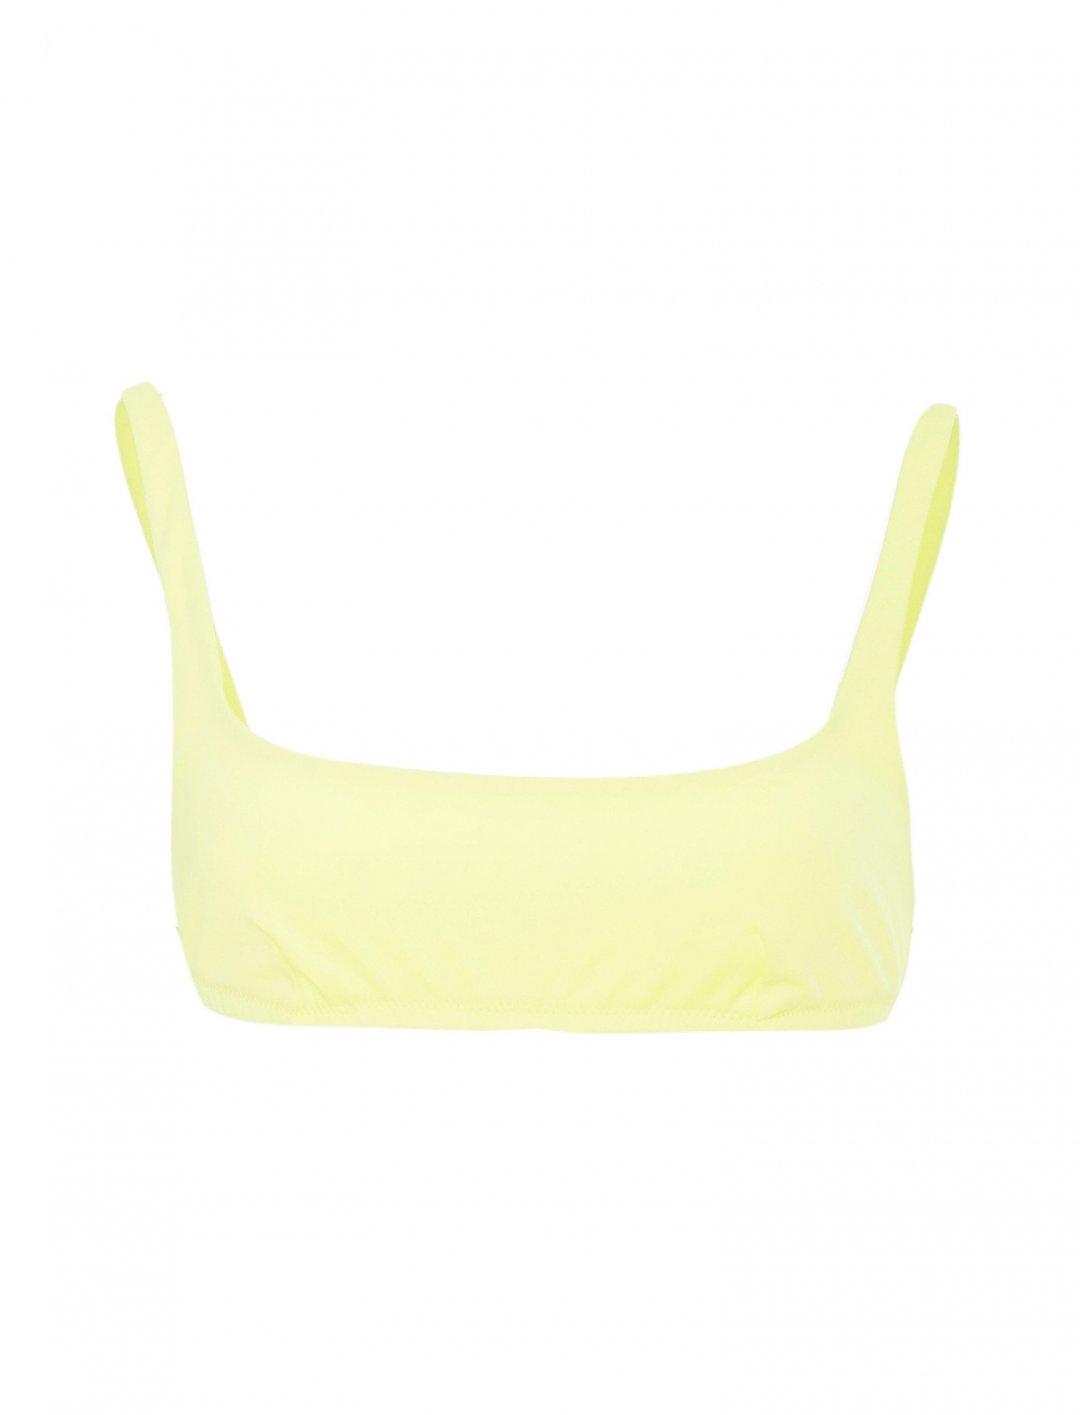 "Zara Larsson's Bikini Top {""id"":5,""product_section_id"":1,""name"":""Clothing"",""order"":5} Araks"